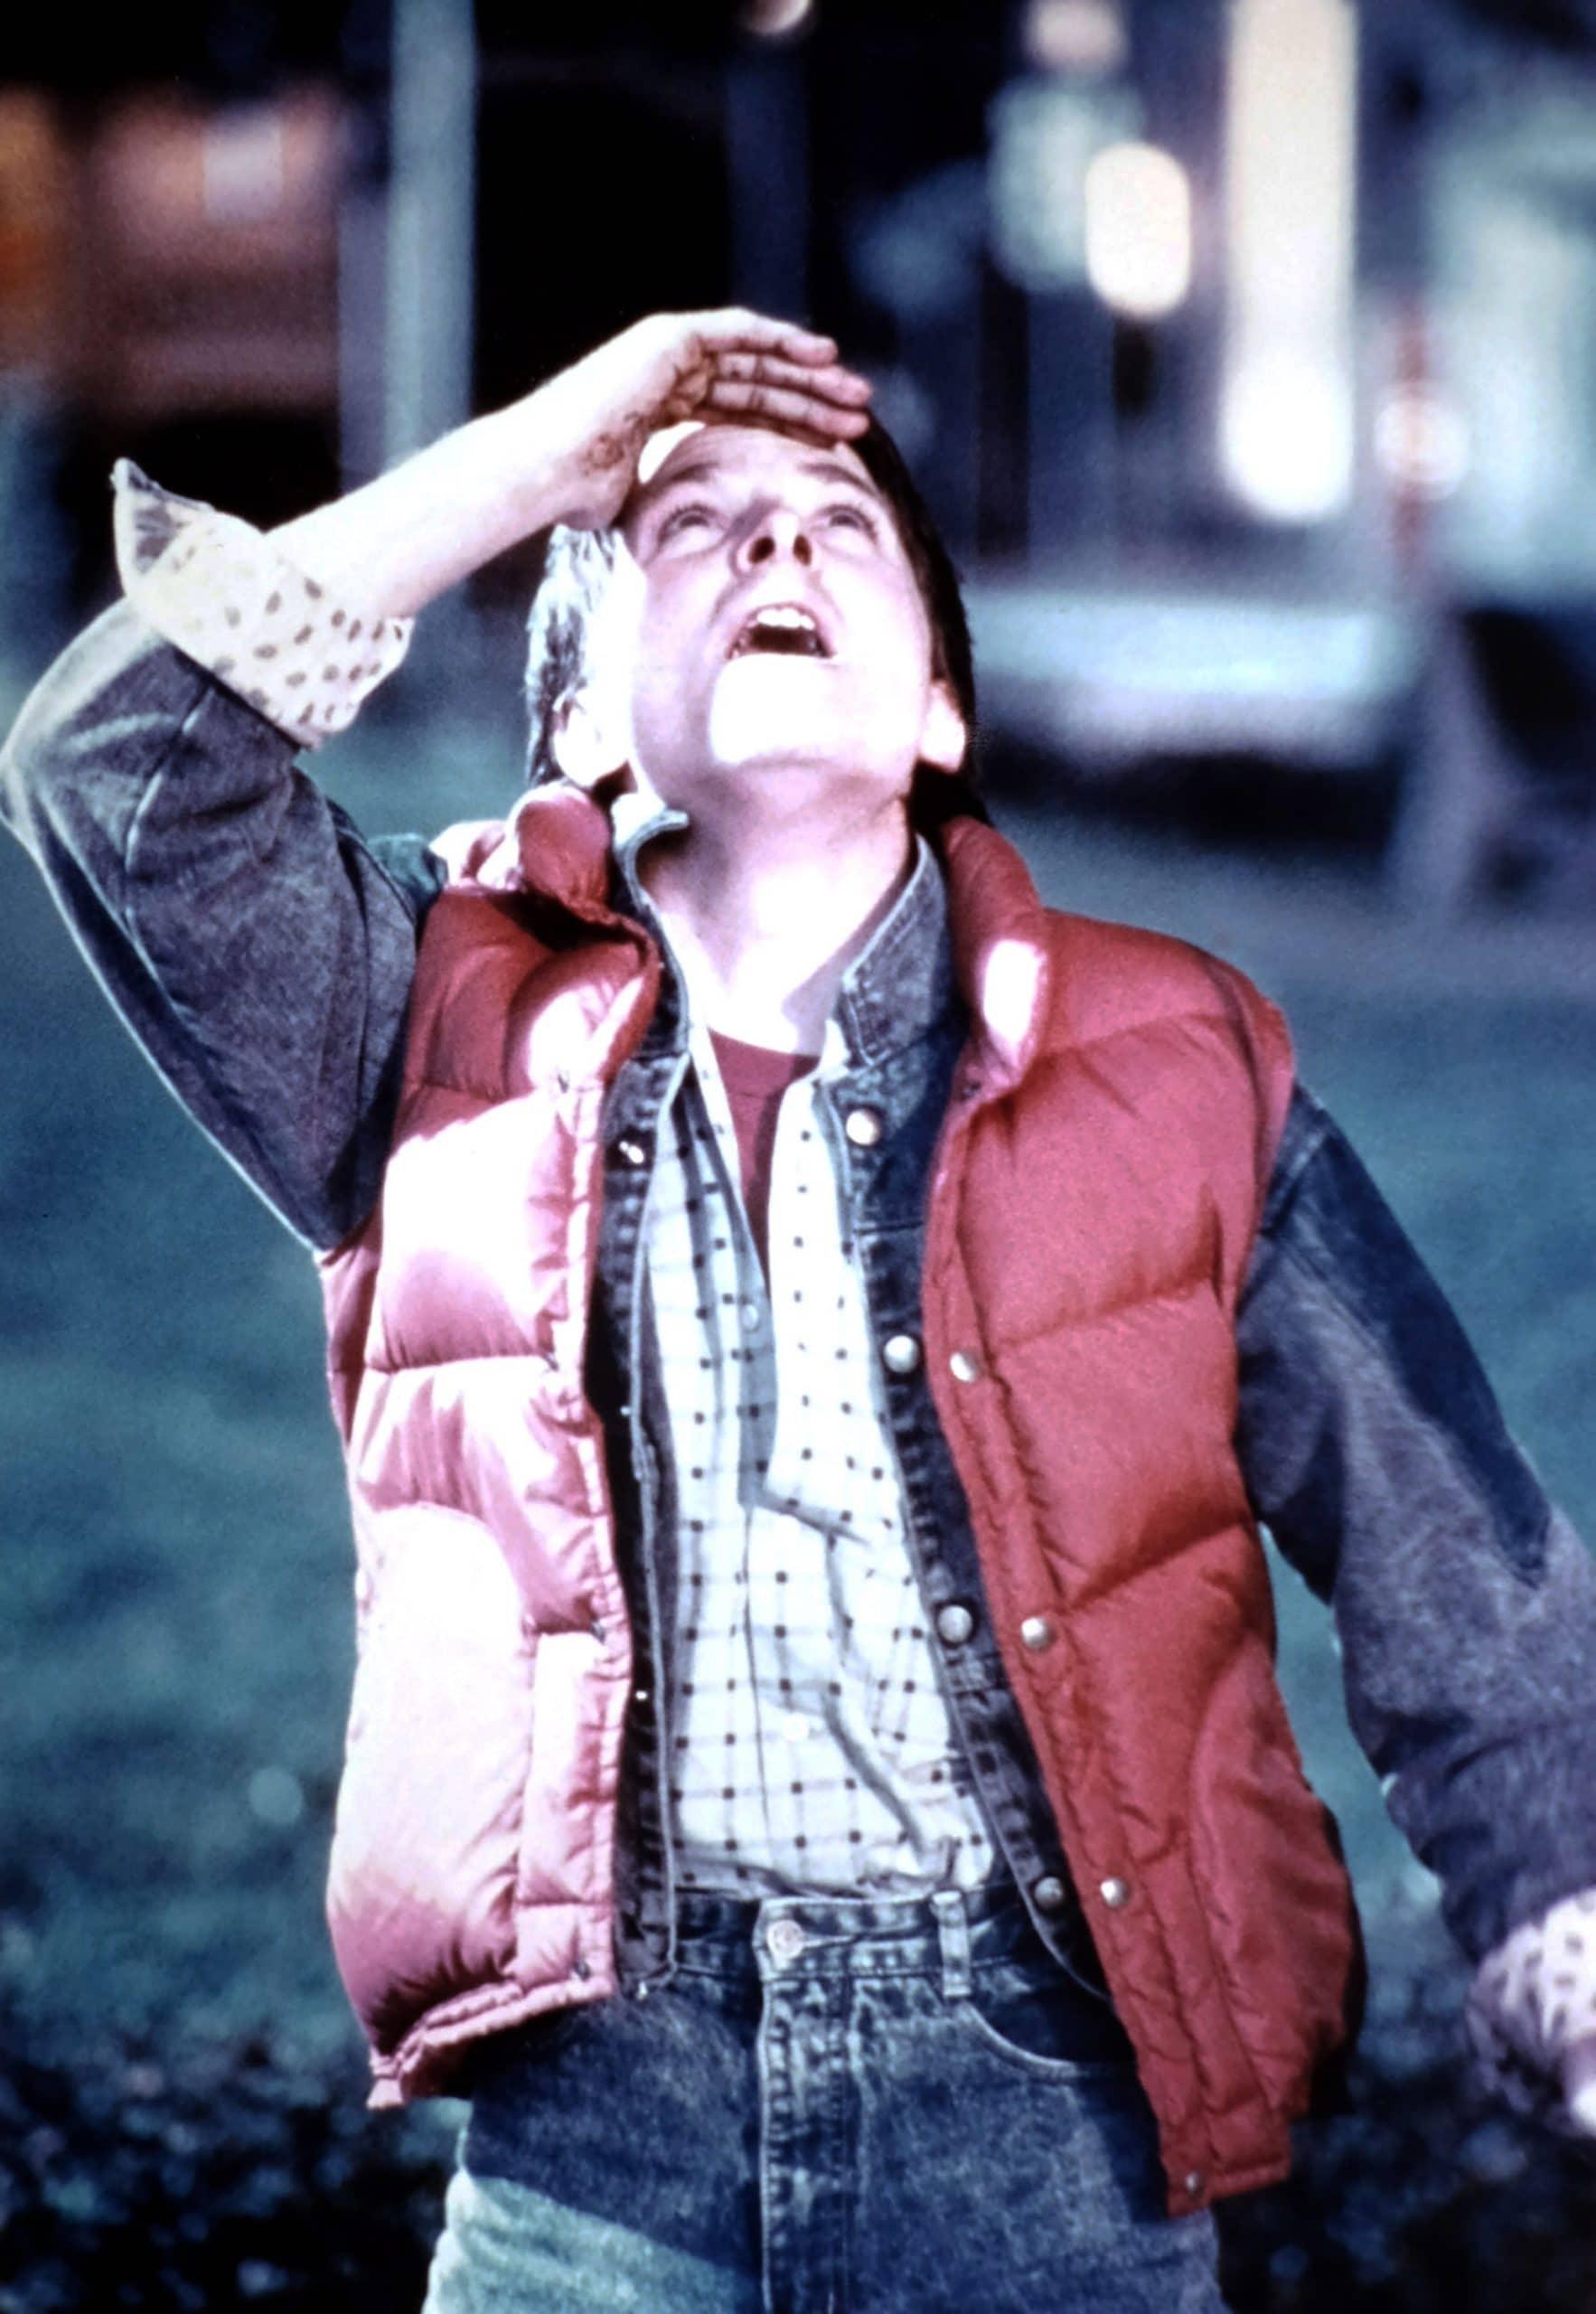 BACK TO THE FUTURE, Michael J. Fox, 1985